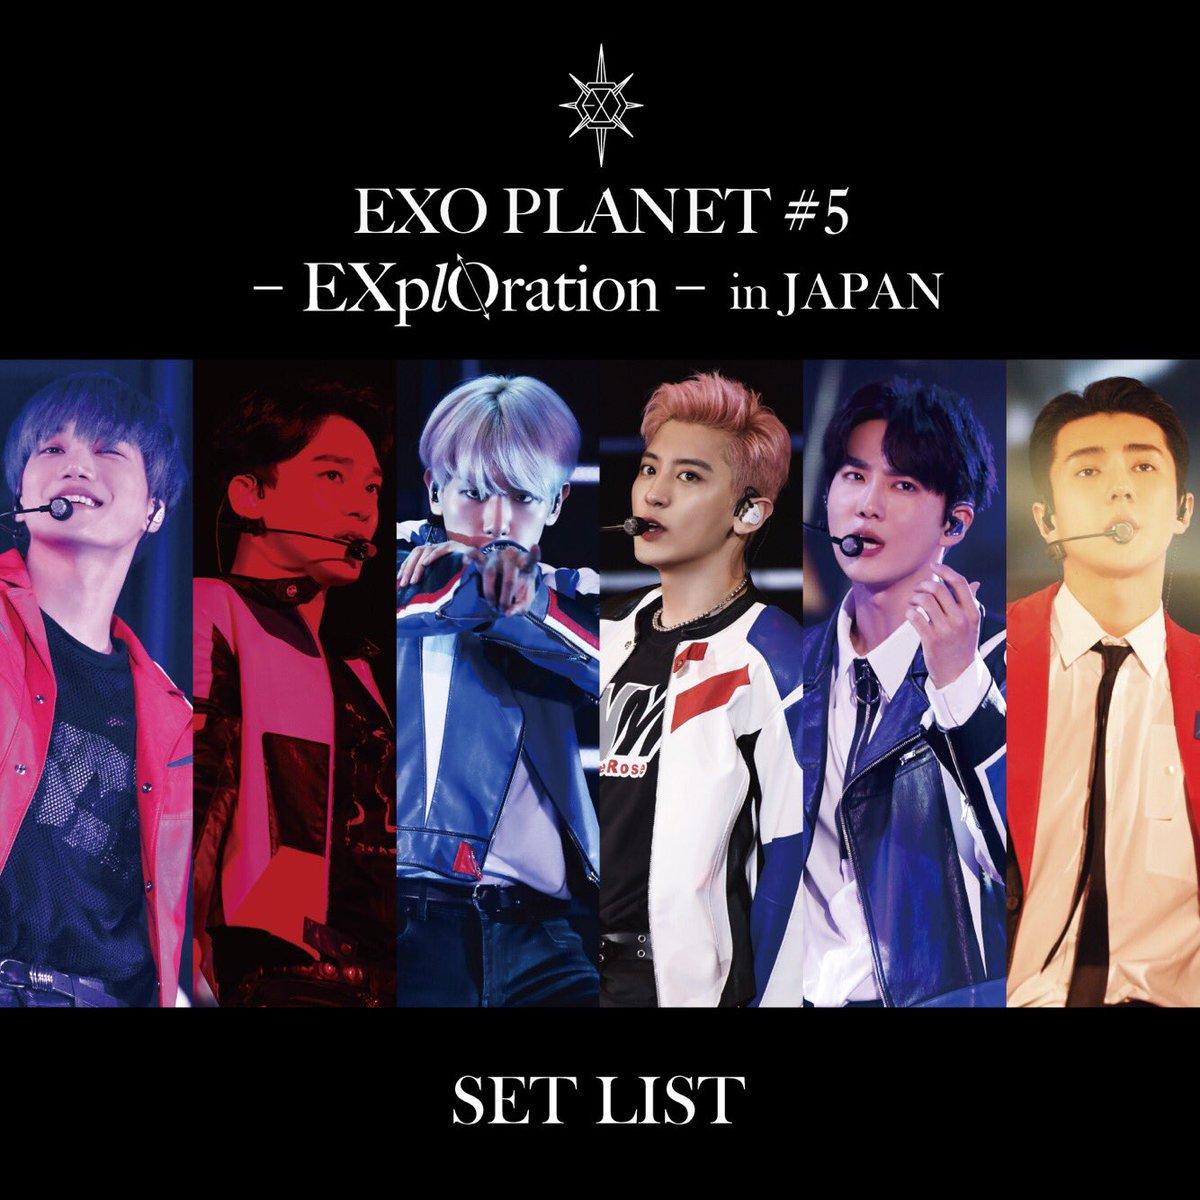 「EXO PLANET #5 - EXplOration - in JAPAN」SET LISTプレイリストを各ストリーミング配信サイトで公開! 昨年開催されたワールドツアー日本公演を思い出しながら、是非お楽しみください🕊 We are ONE👍✨ 🎧avex.lnk.to/EXOPLANET5_JAP… ※「BIRD」以外の楽曲は、韓国ソウル公演のLive音源になります。